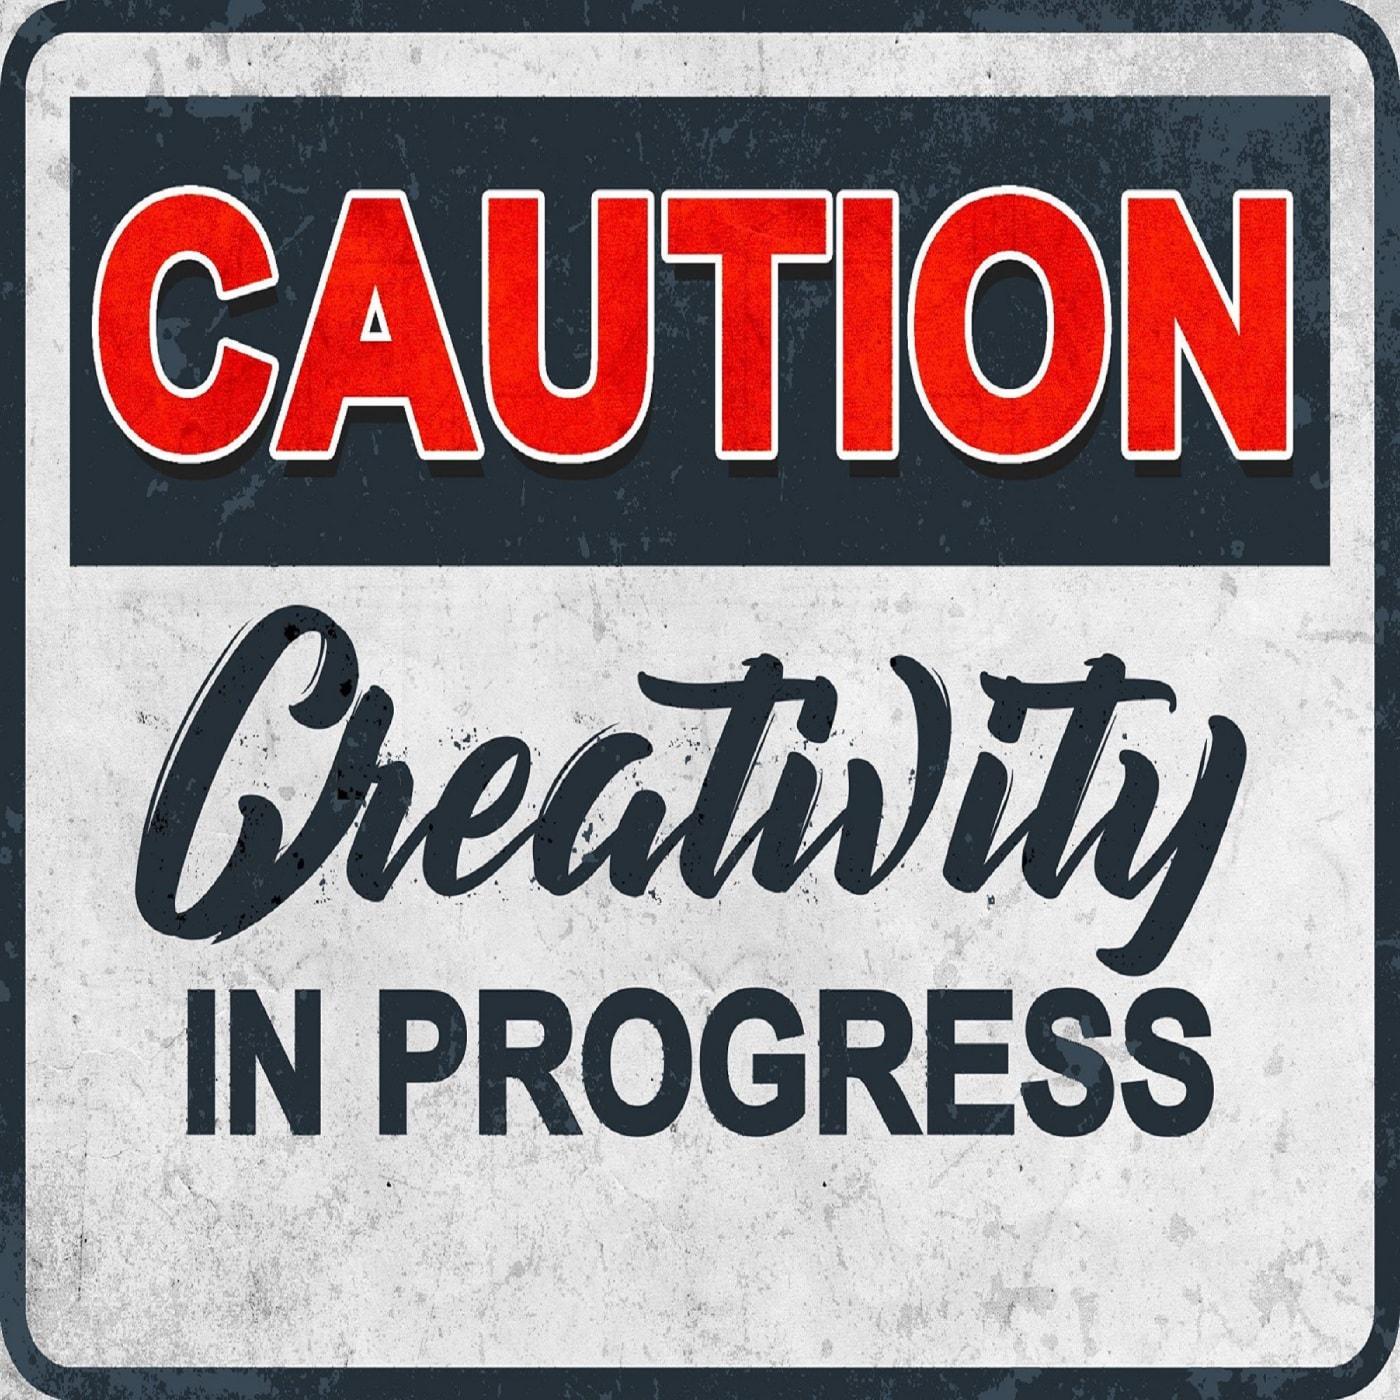 CreativityInProgressPodcast1400by1400-min.jpg